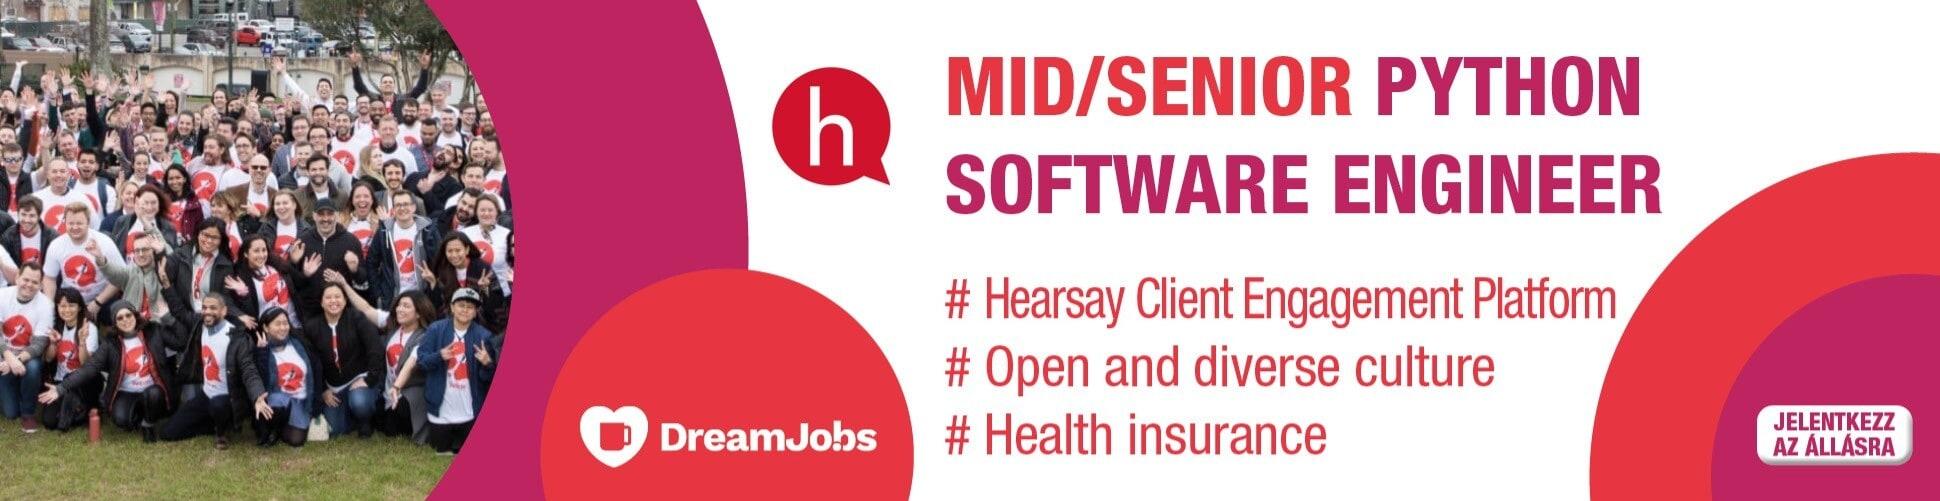 hearsay-systems-midsenior-python-software-engineer.